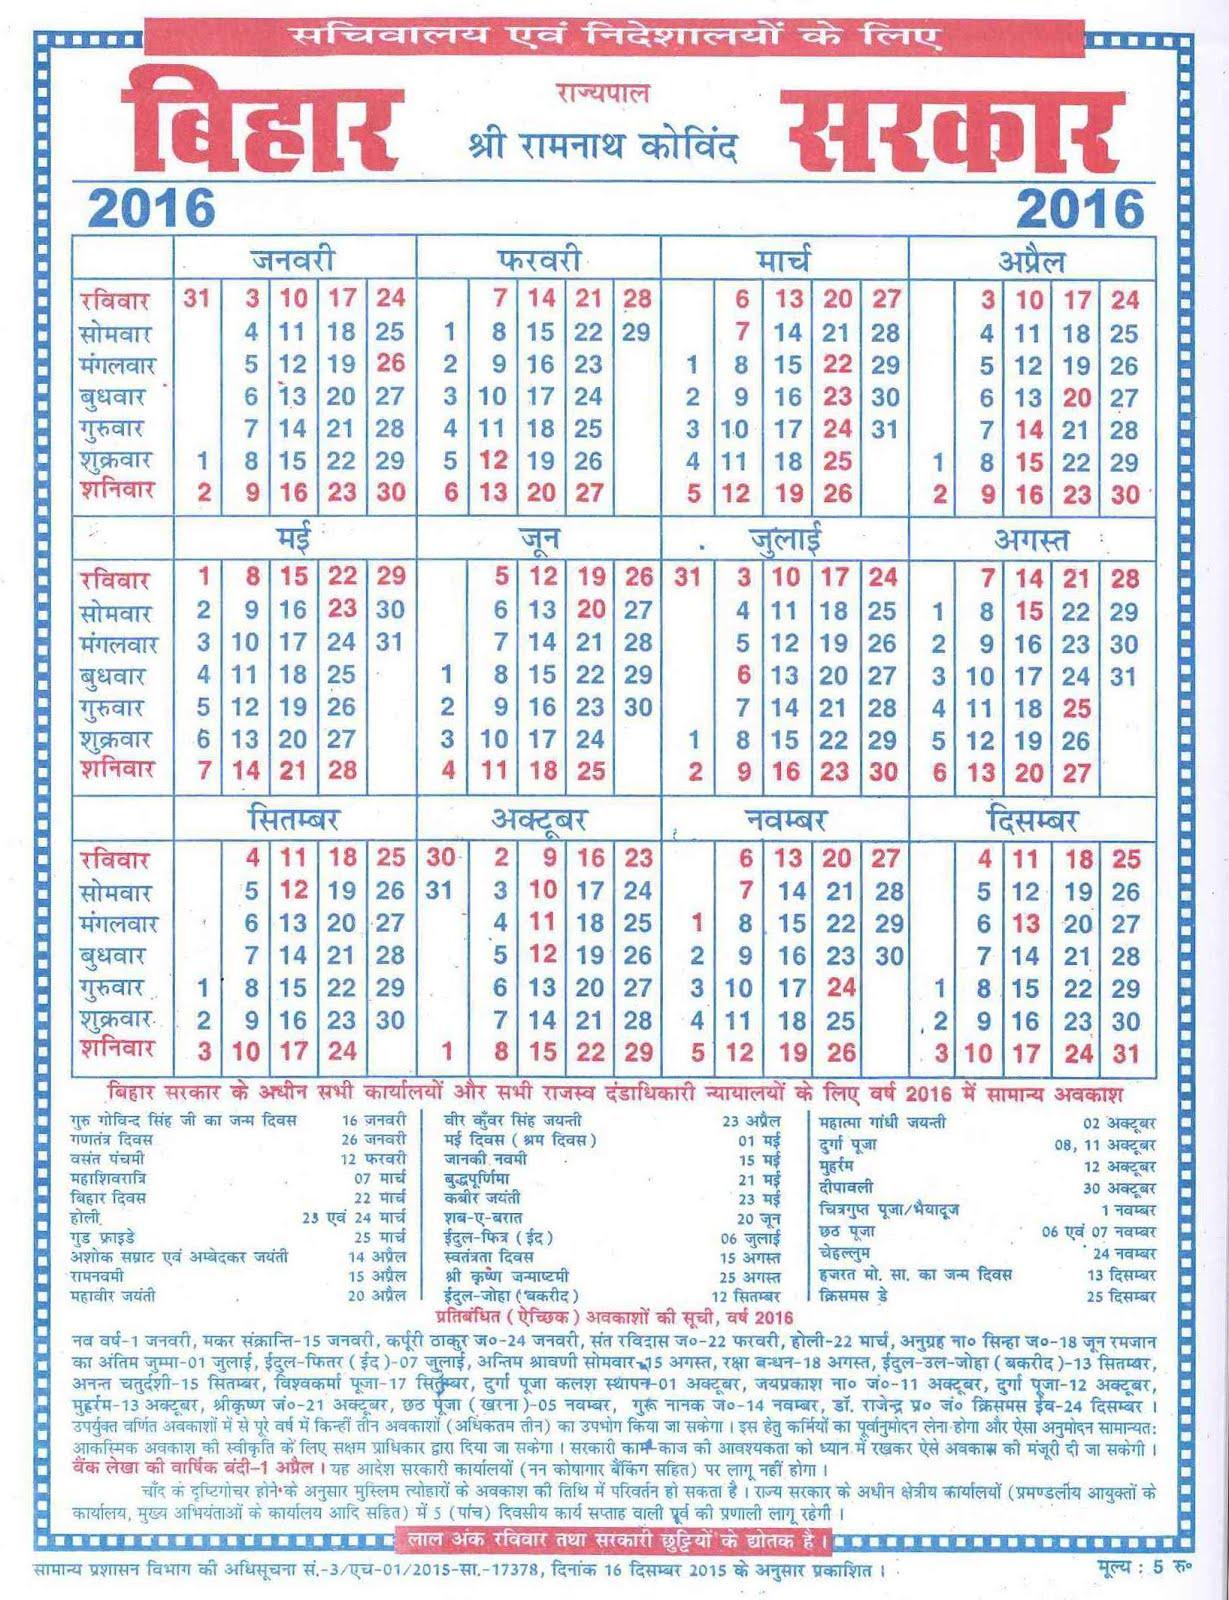 Bihar Government Calendar 2016 Download with Bihar Govt Calender